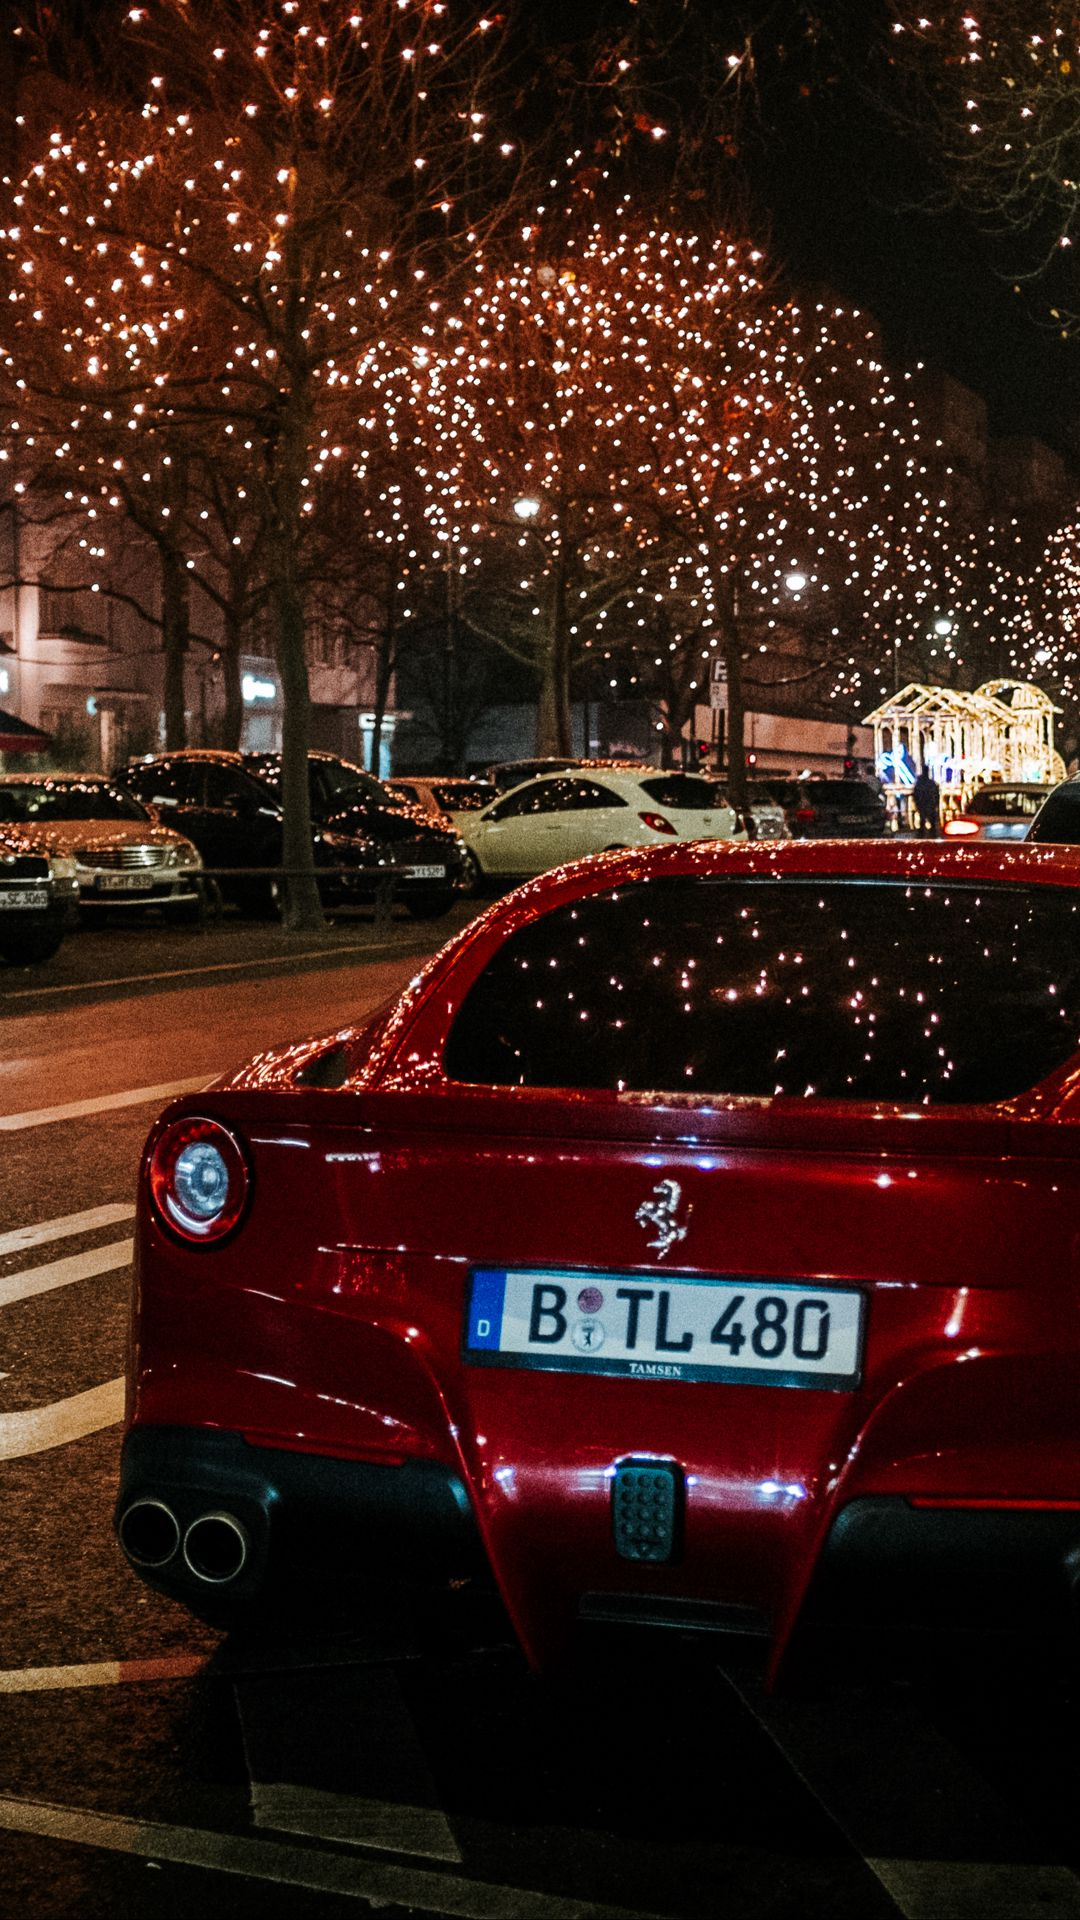 1080x1920 Wallpaper ferrari, rear view, red, night city, scenery